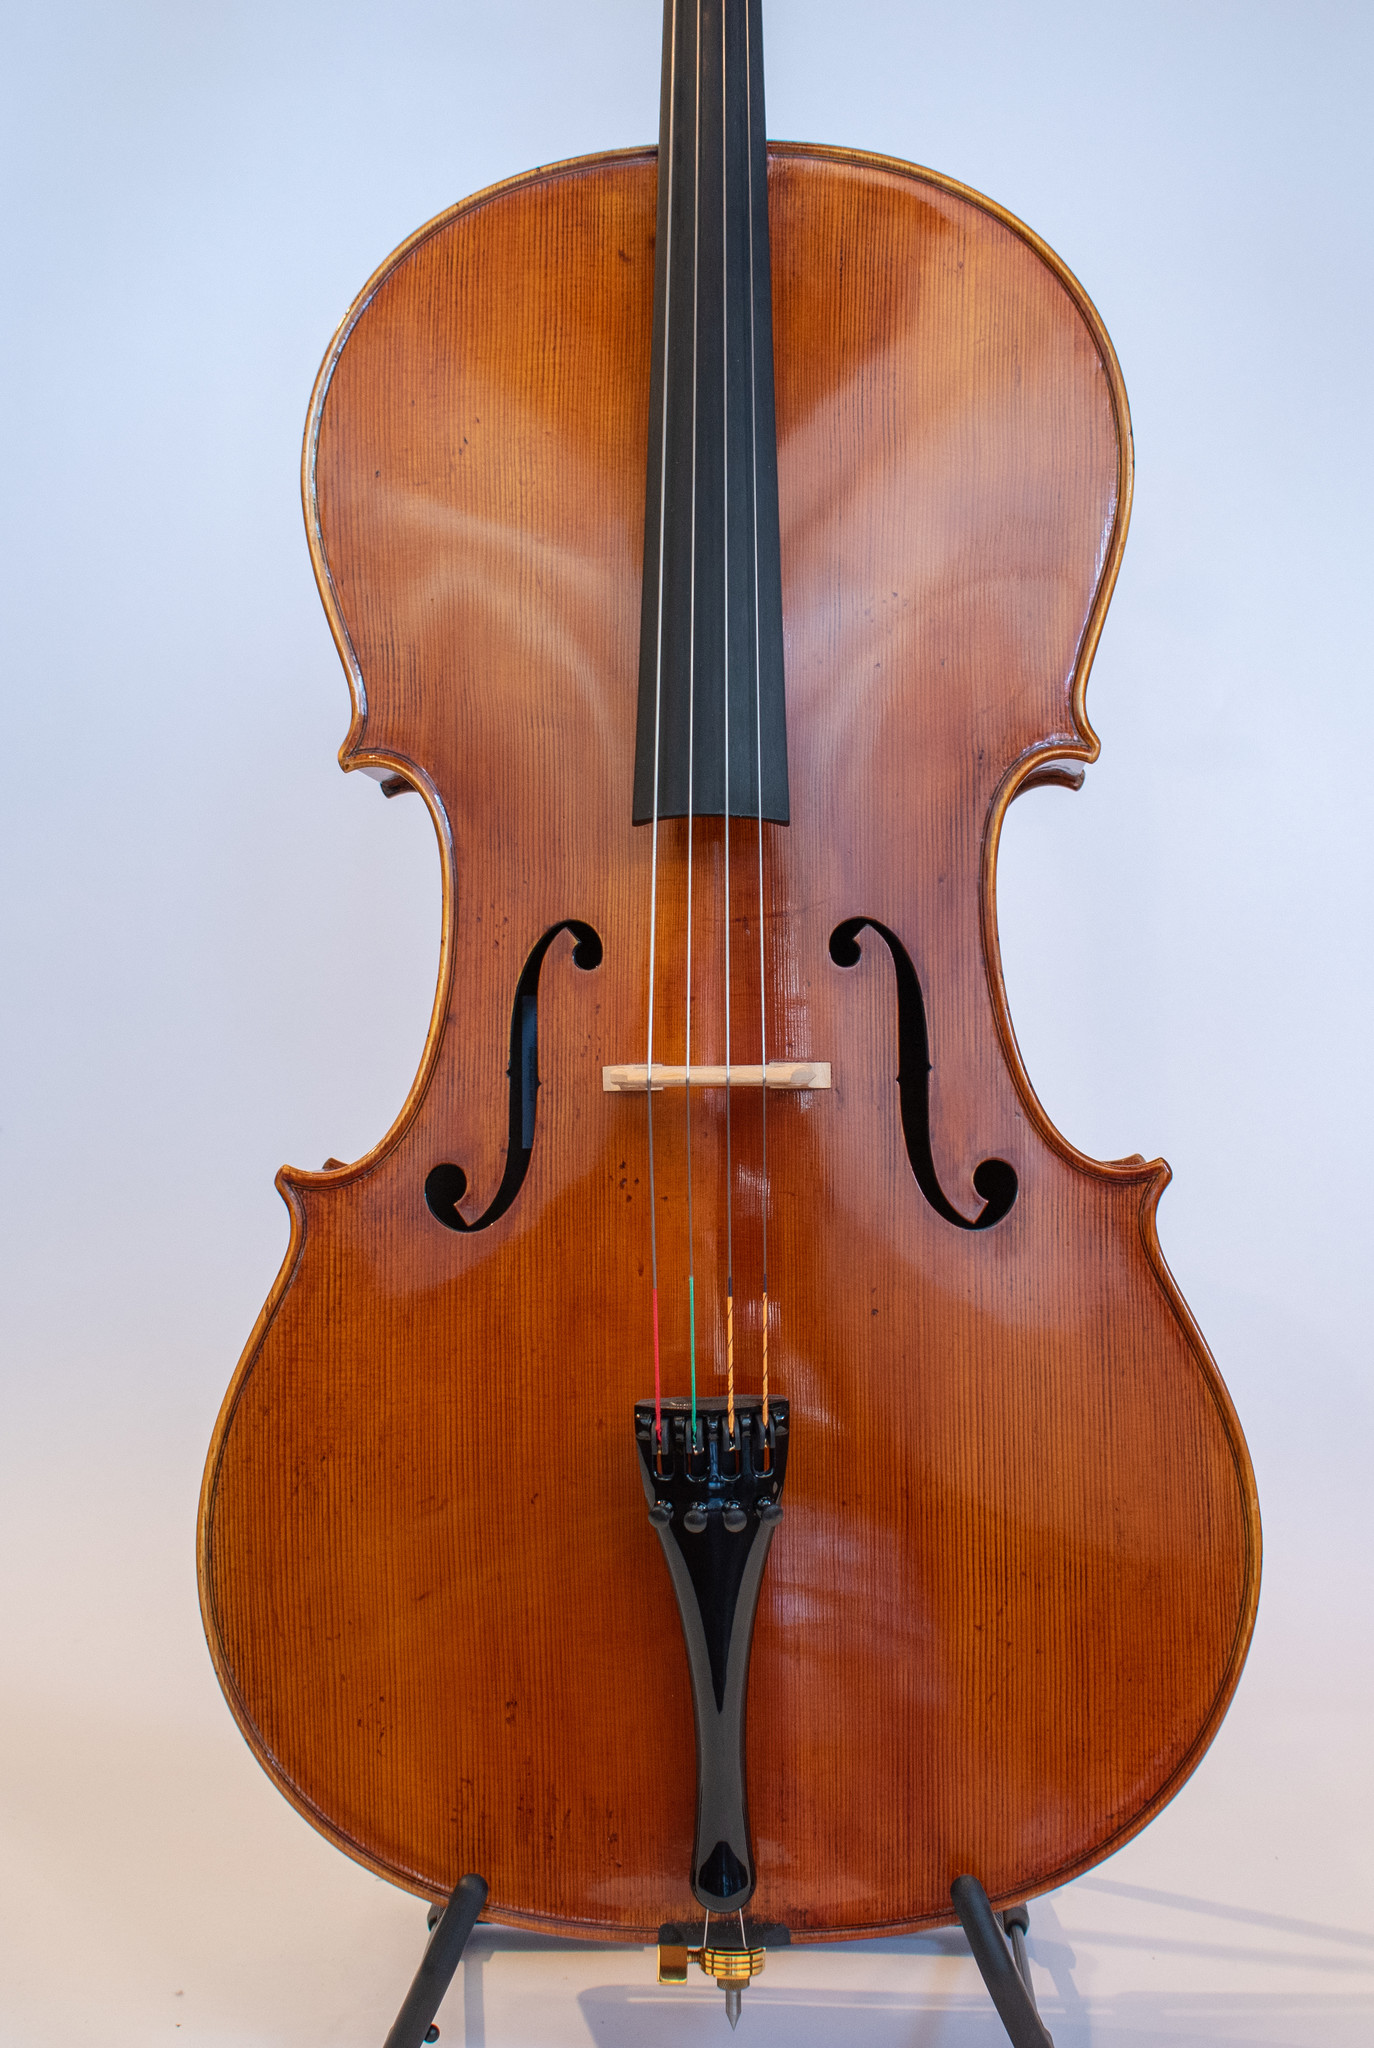 Akos Balazs Gold cello, 2019, Budapest, Hungary